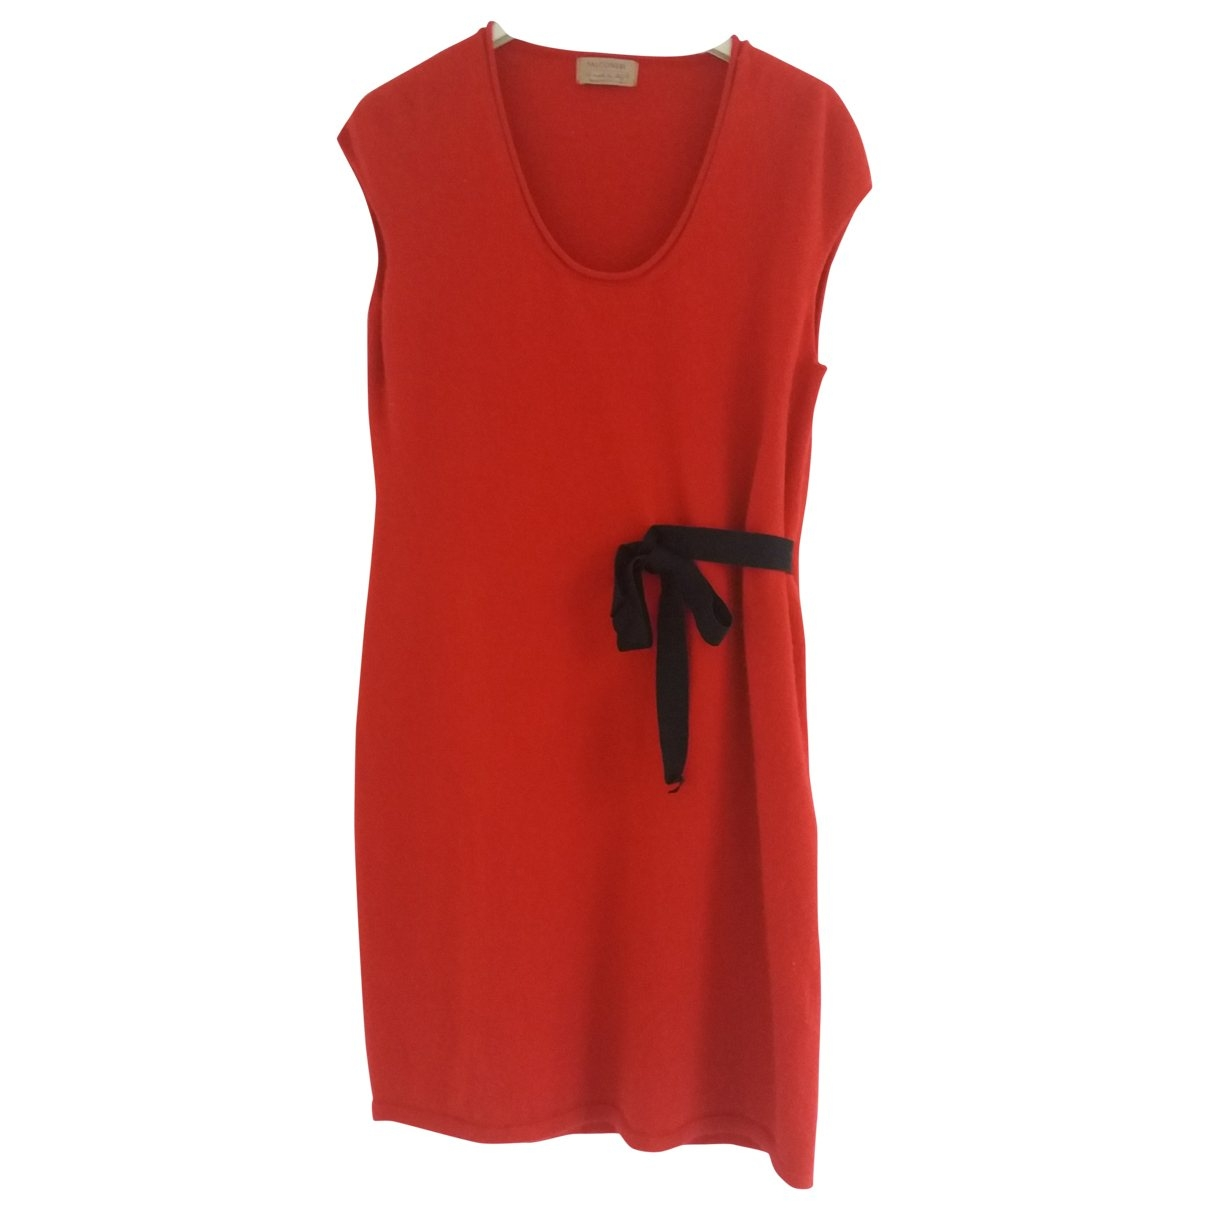 Falconeri \N Red Cashmere dress for Women S International